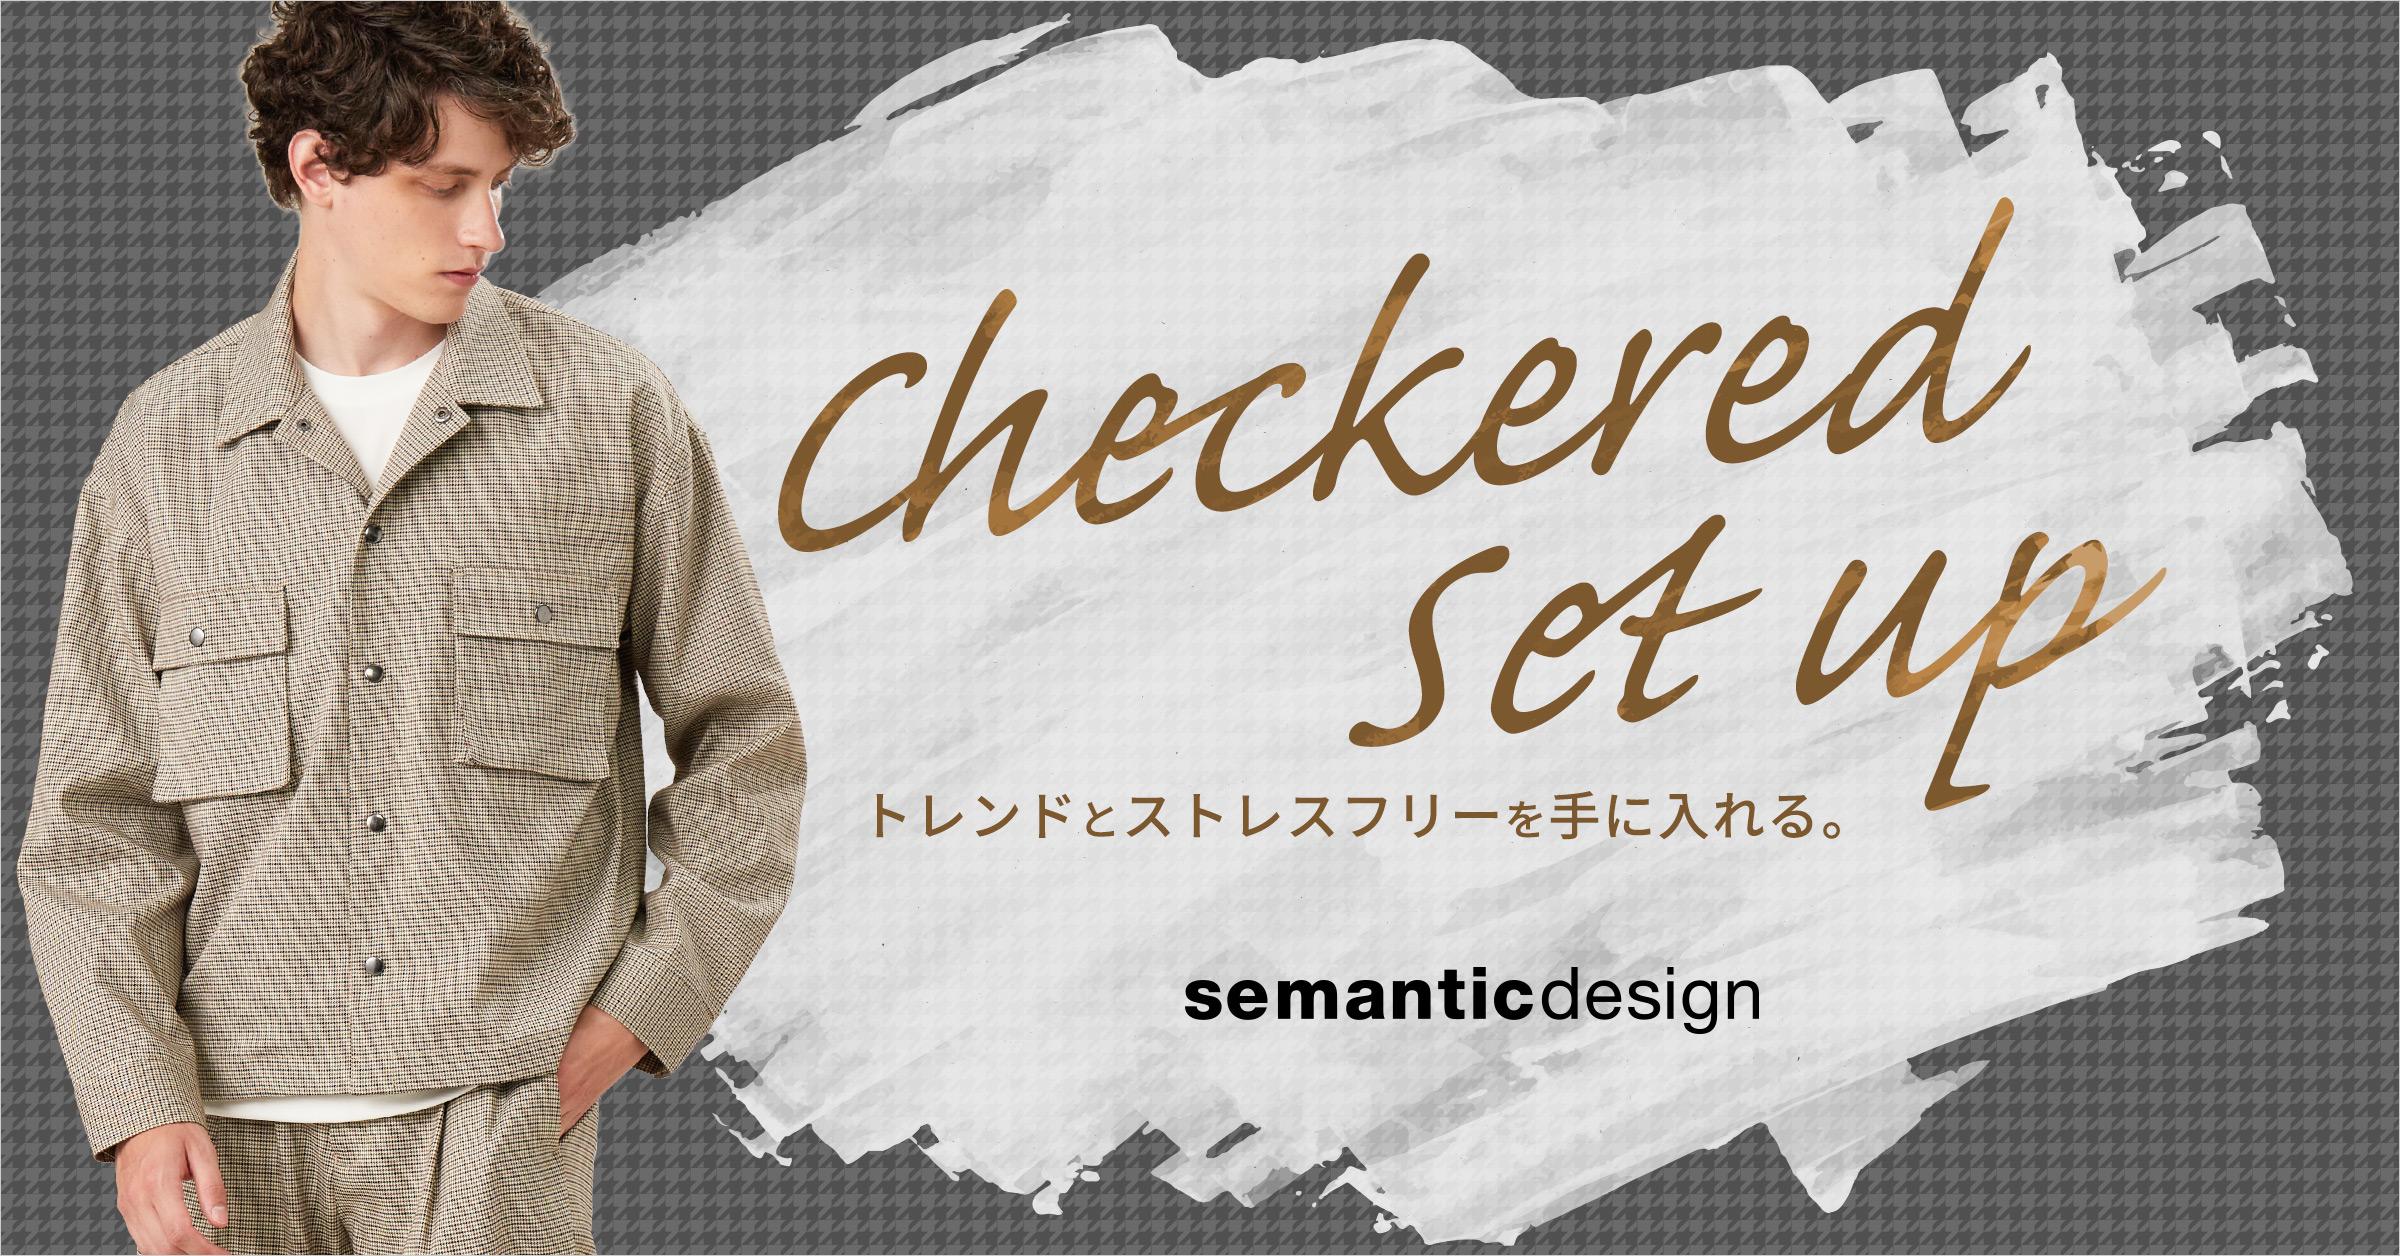 semanticdesign Checkred Set up(セマンティックデザイン チェッカードセットアップ)